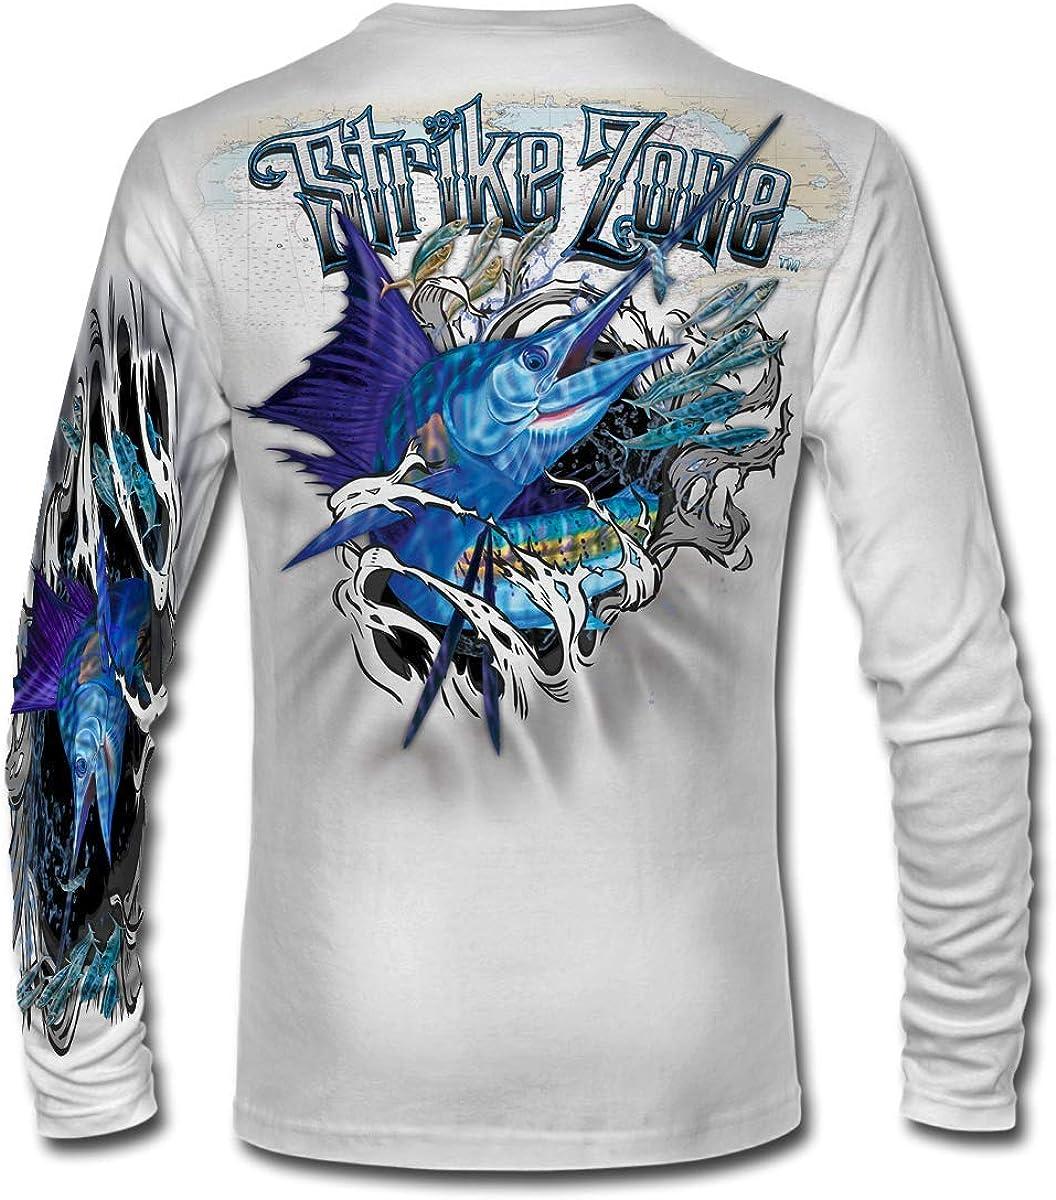 Jason Mathias Strike Zone Branded goods Sailfish High Performance Shirt LS Max 86% OFF